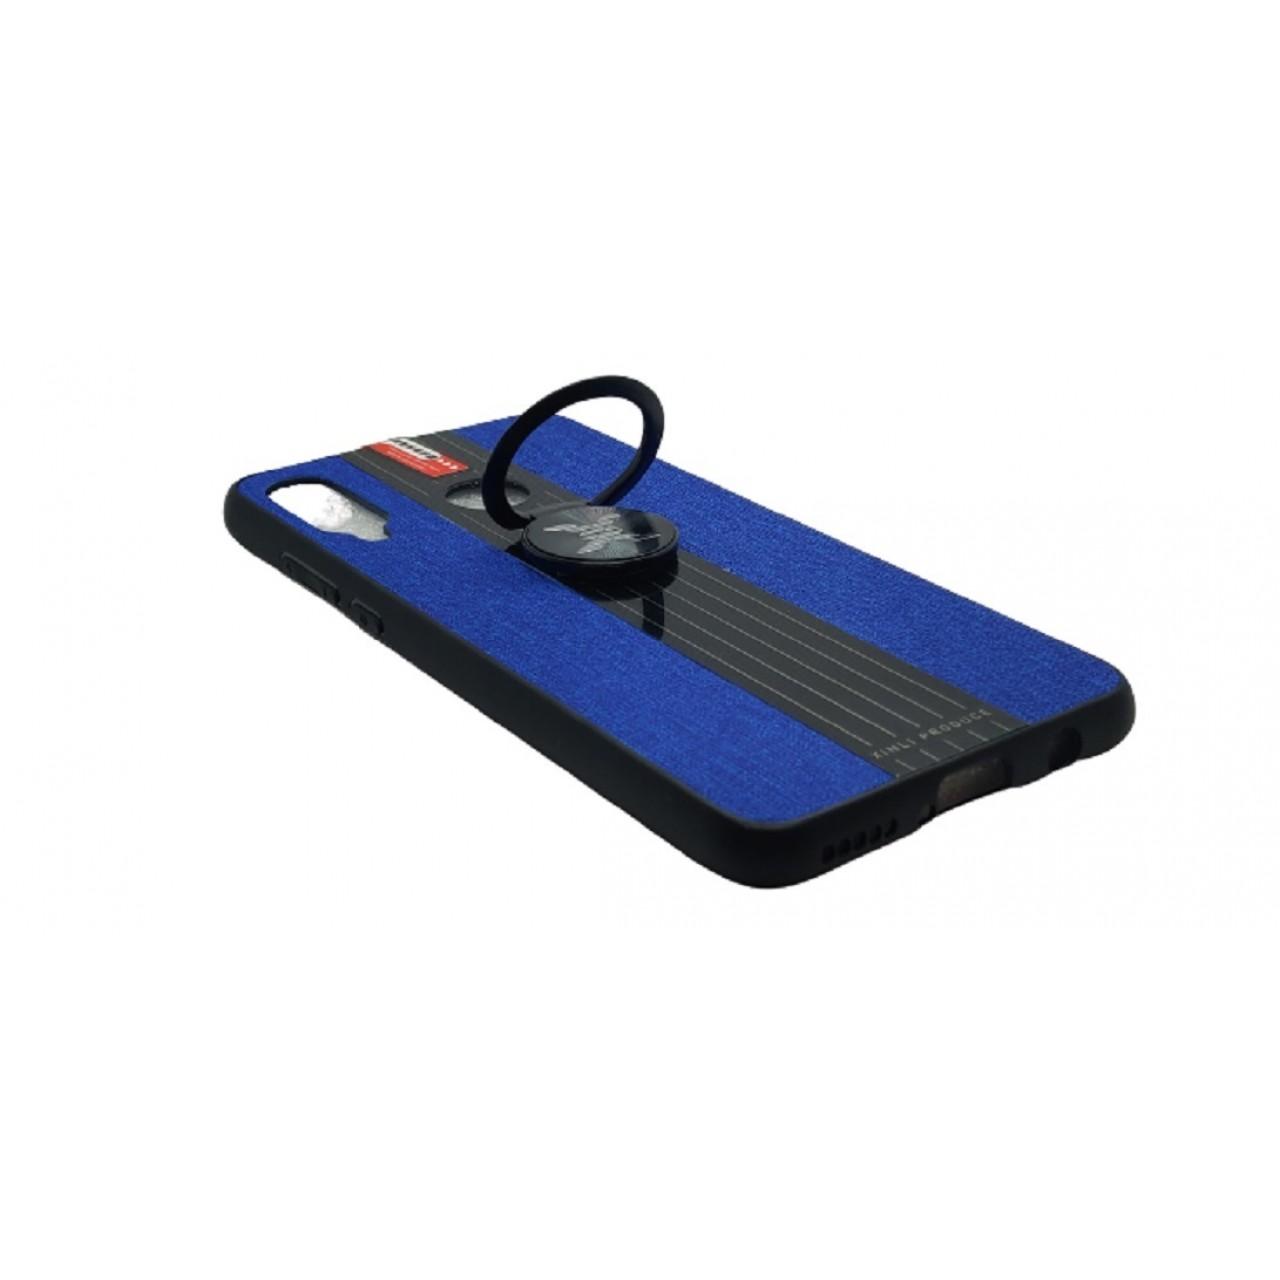 Back Case Cloth Pattern with ring for Huawei P30 Lite Blue- Θήκη προστασίας με δαχτυλίδι στην πλάτη Μπλε- OEM